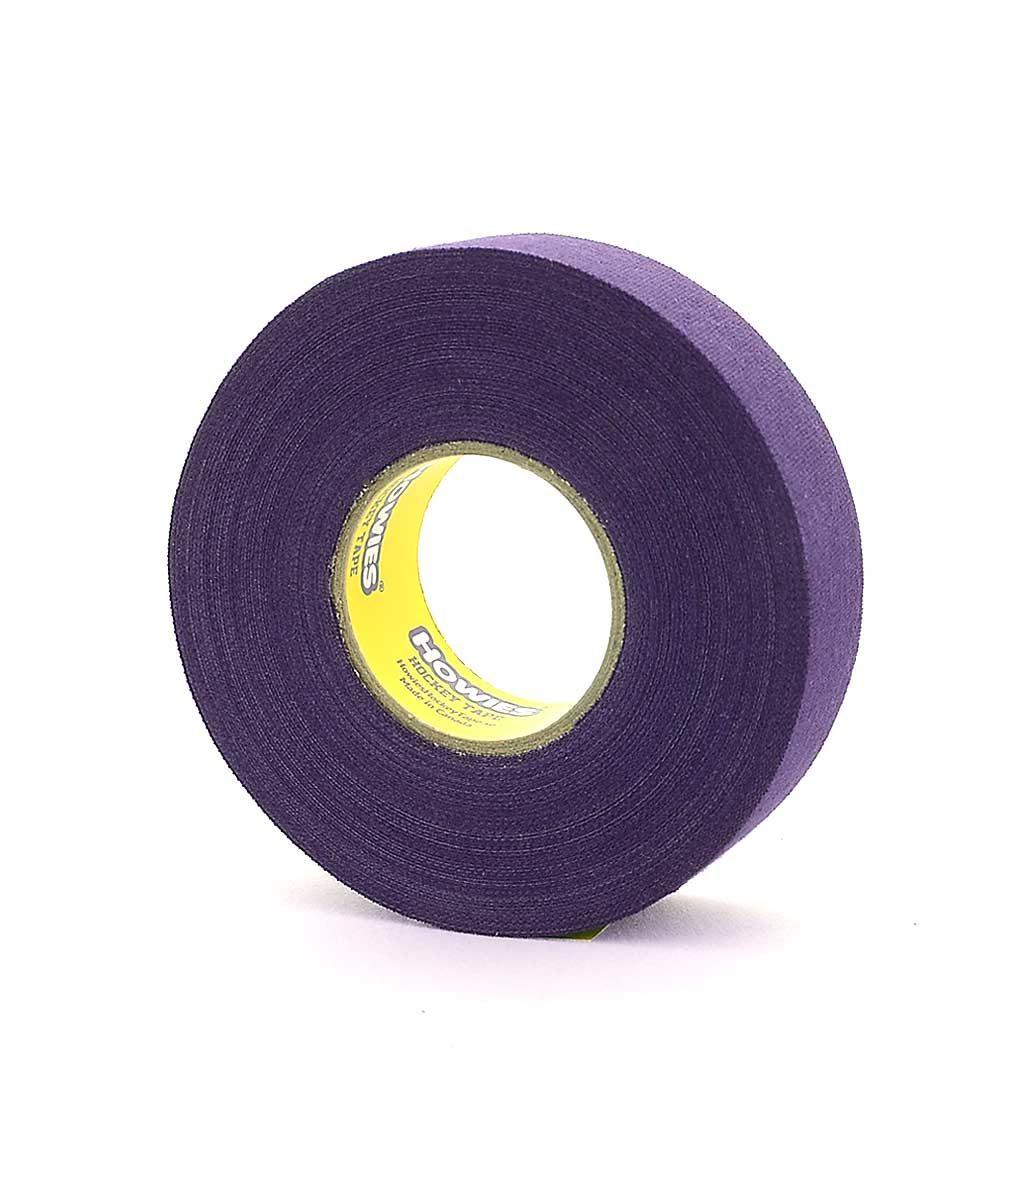 Hockey Stick Wax Howies Hockey Tape 3 pack